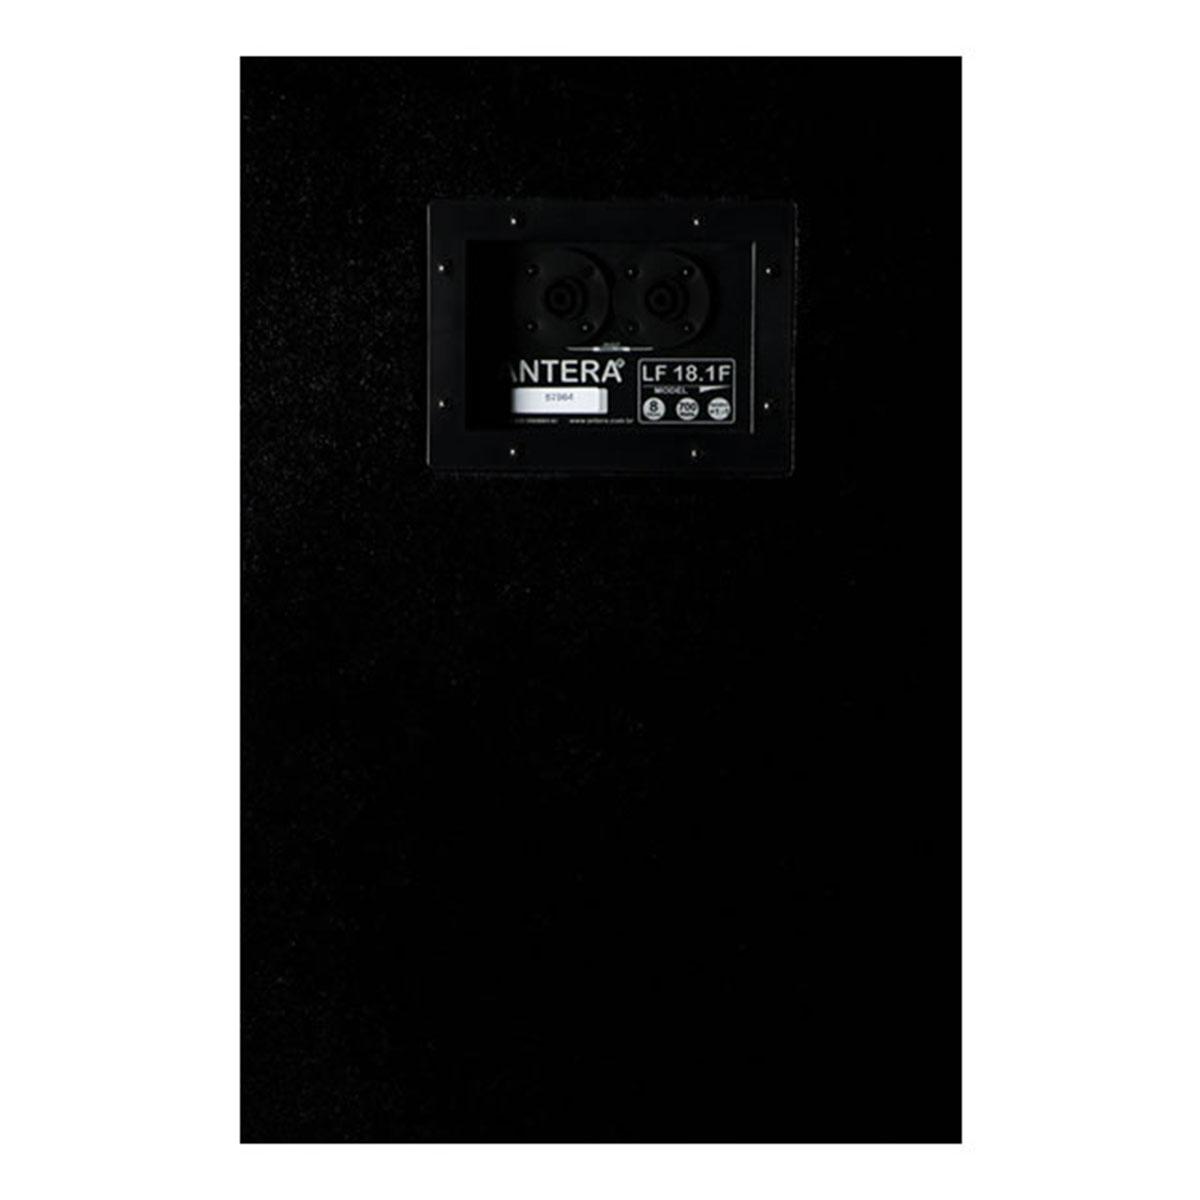 Subwoofer Passivo Fal 18 Pol 700W - LF 18.1 F Antera